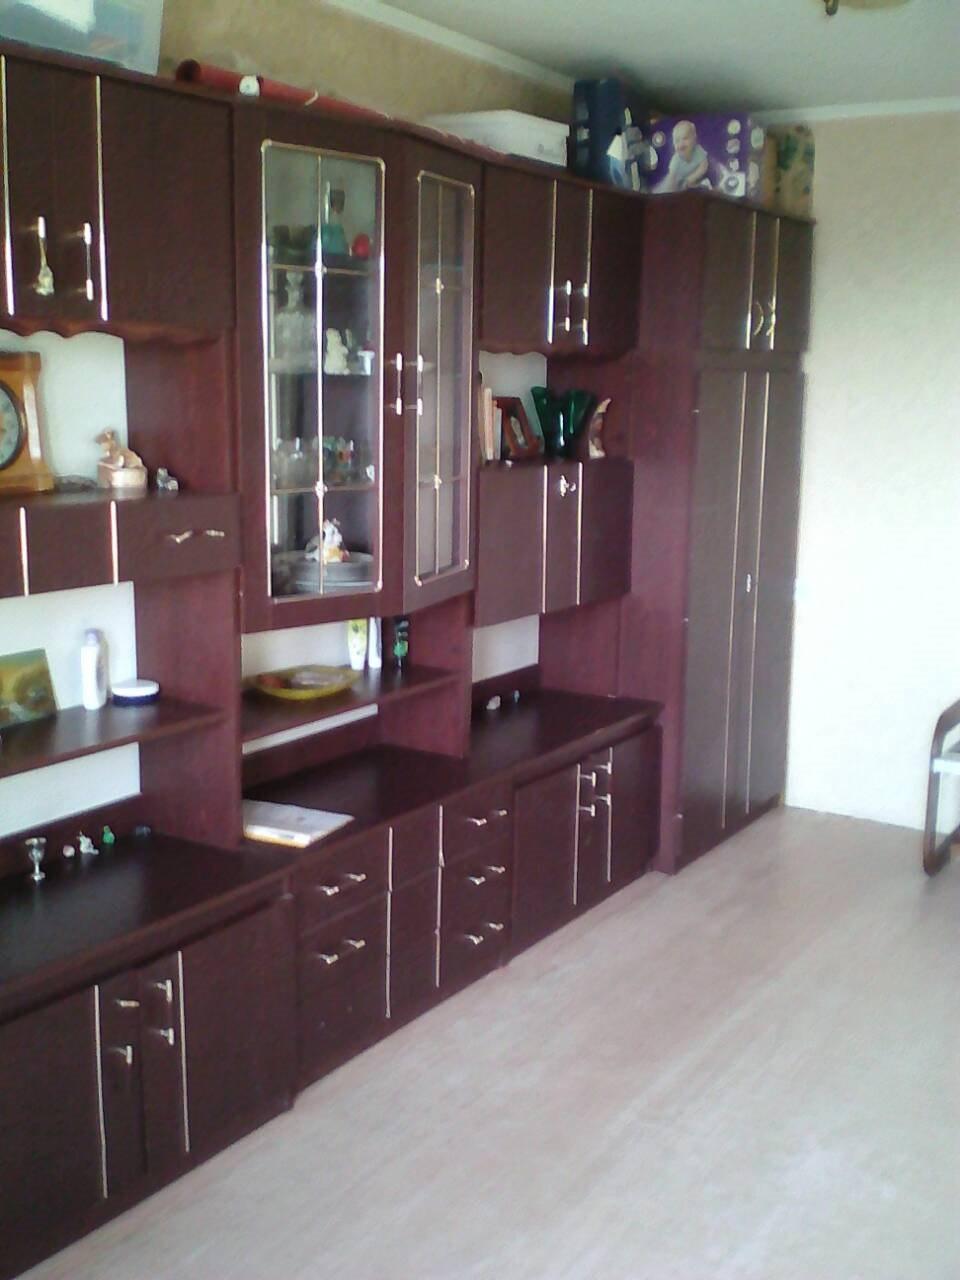 Продажа квартир: 3-комнатная квартира, Калининград, ул. Фрунзе, 75, фото 1